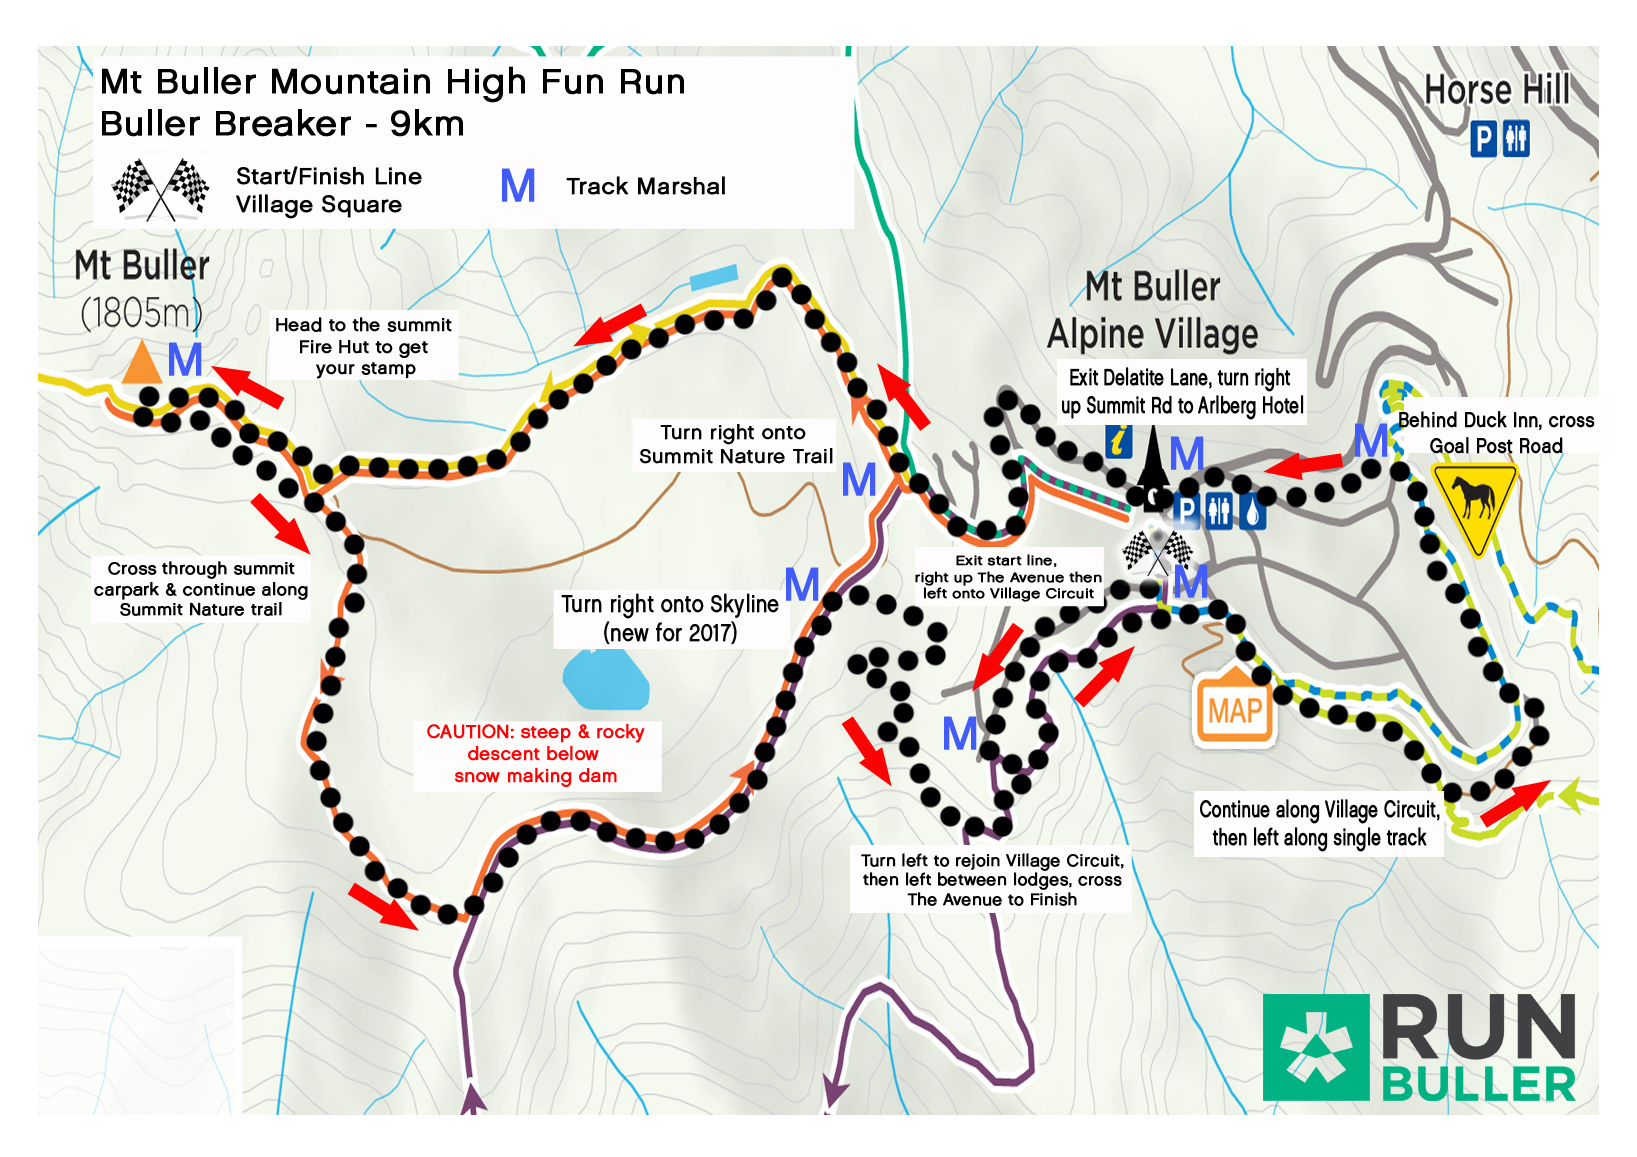 2017 Buller Breaker Course map